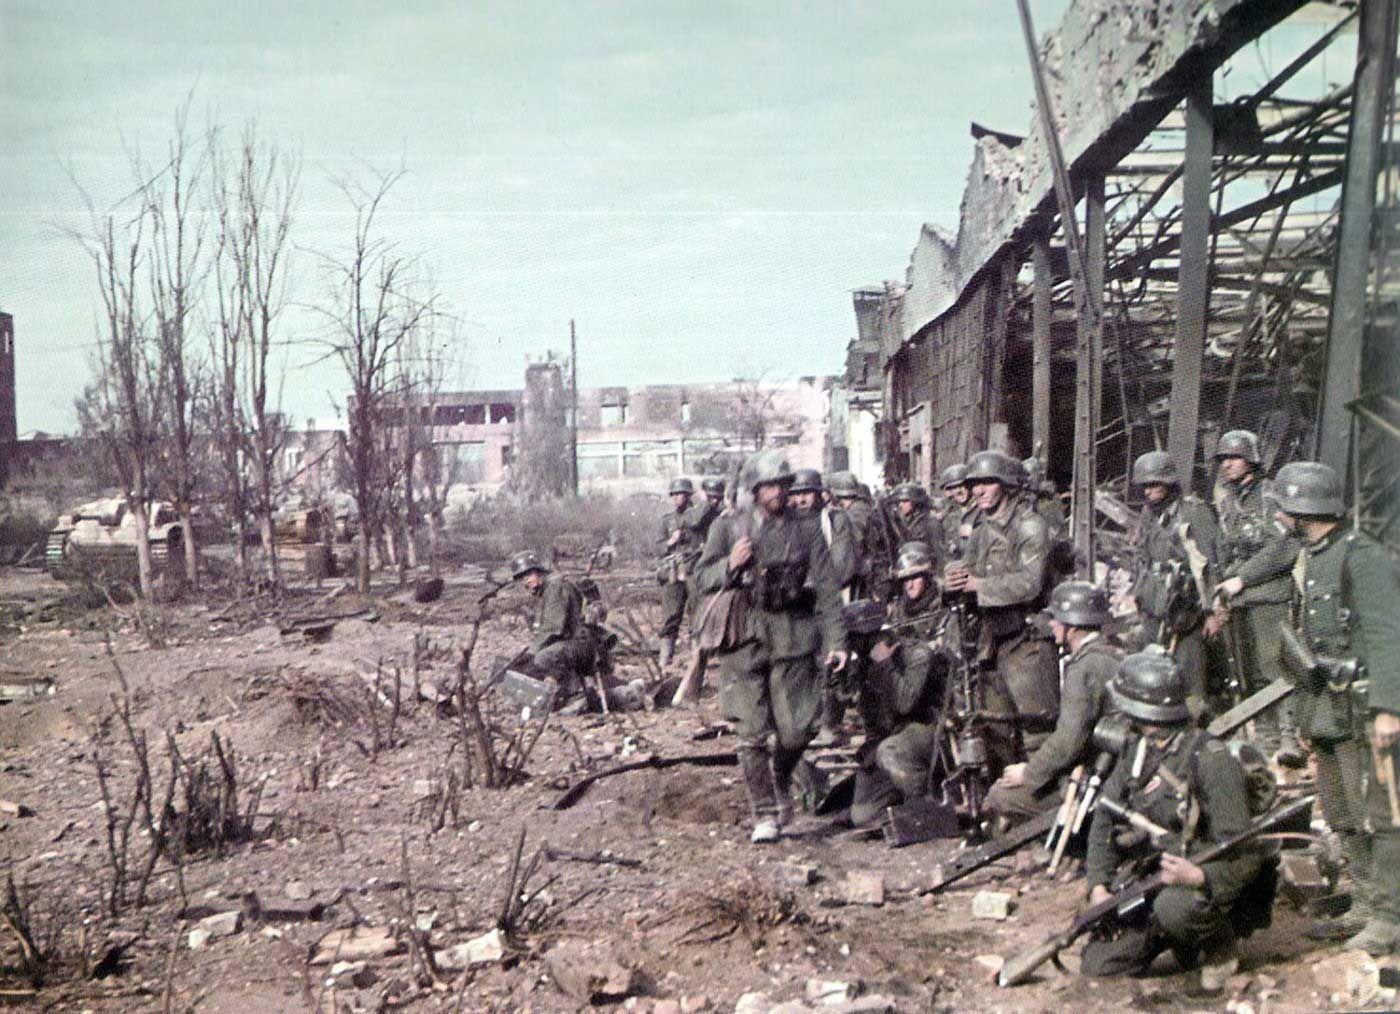 Review Stalingrad Antony Beevor Battle Of Stalingrad Wwii